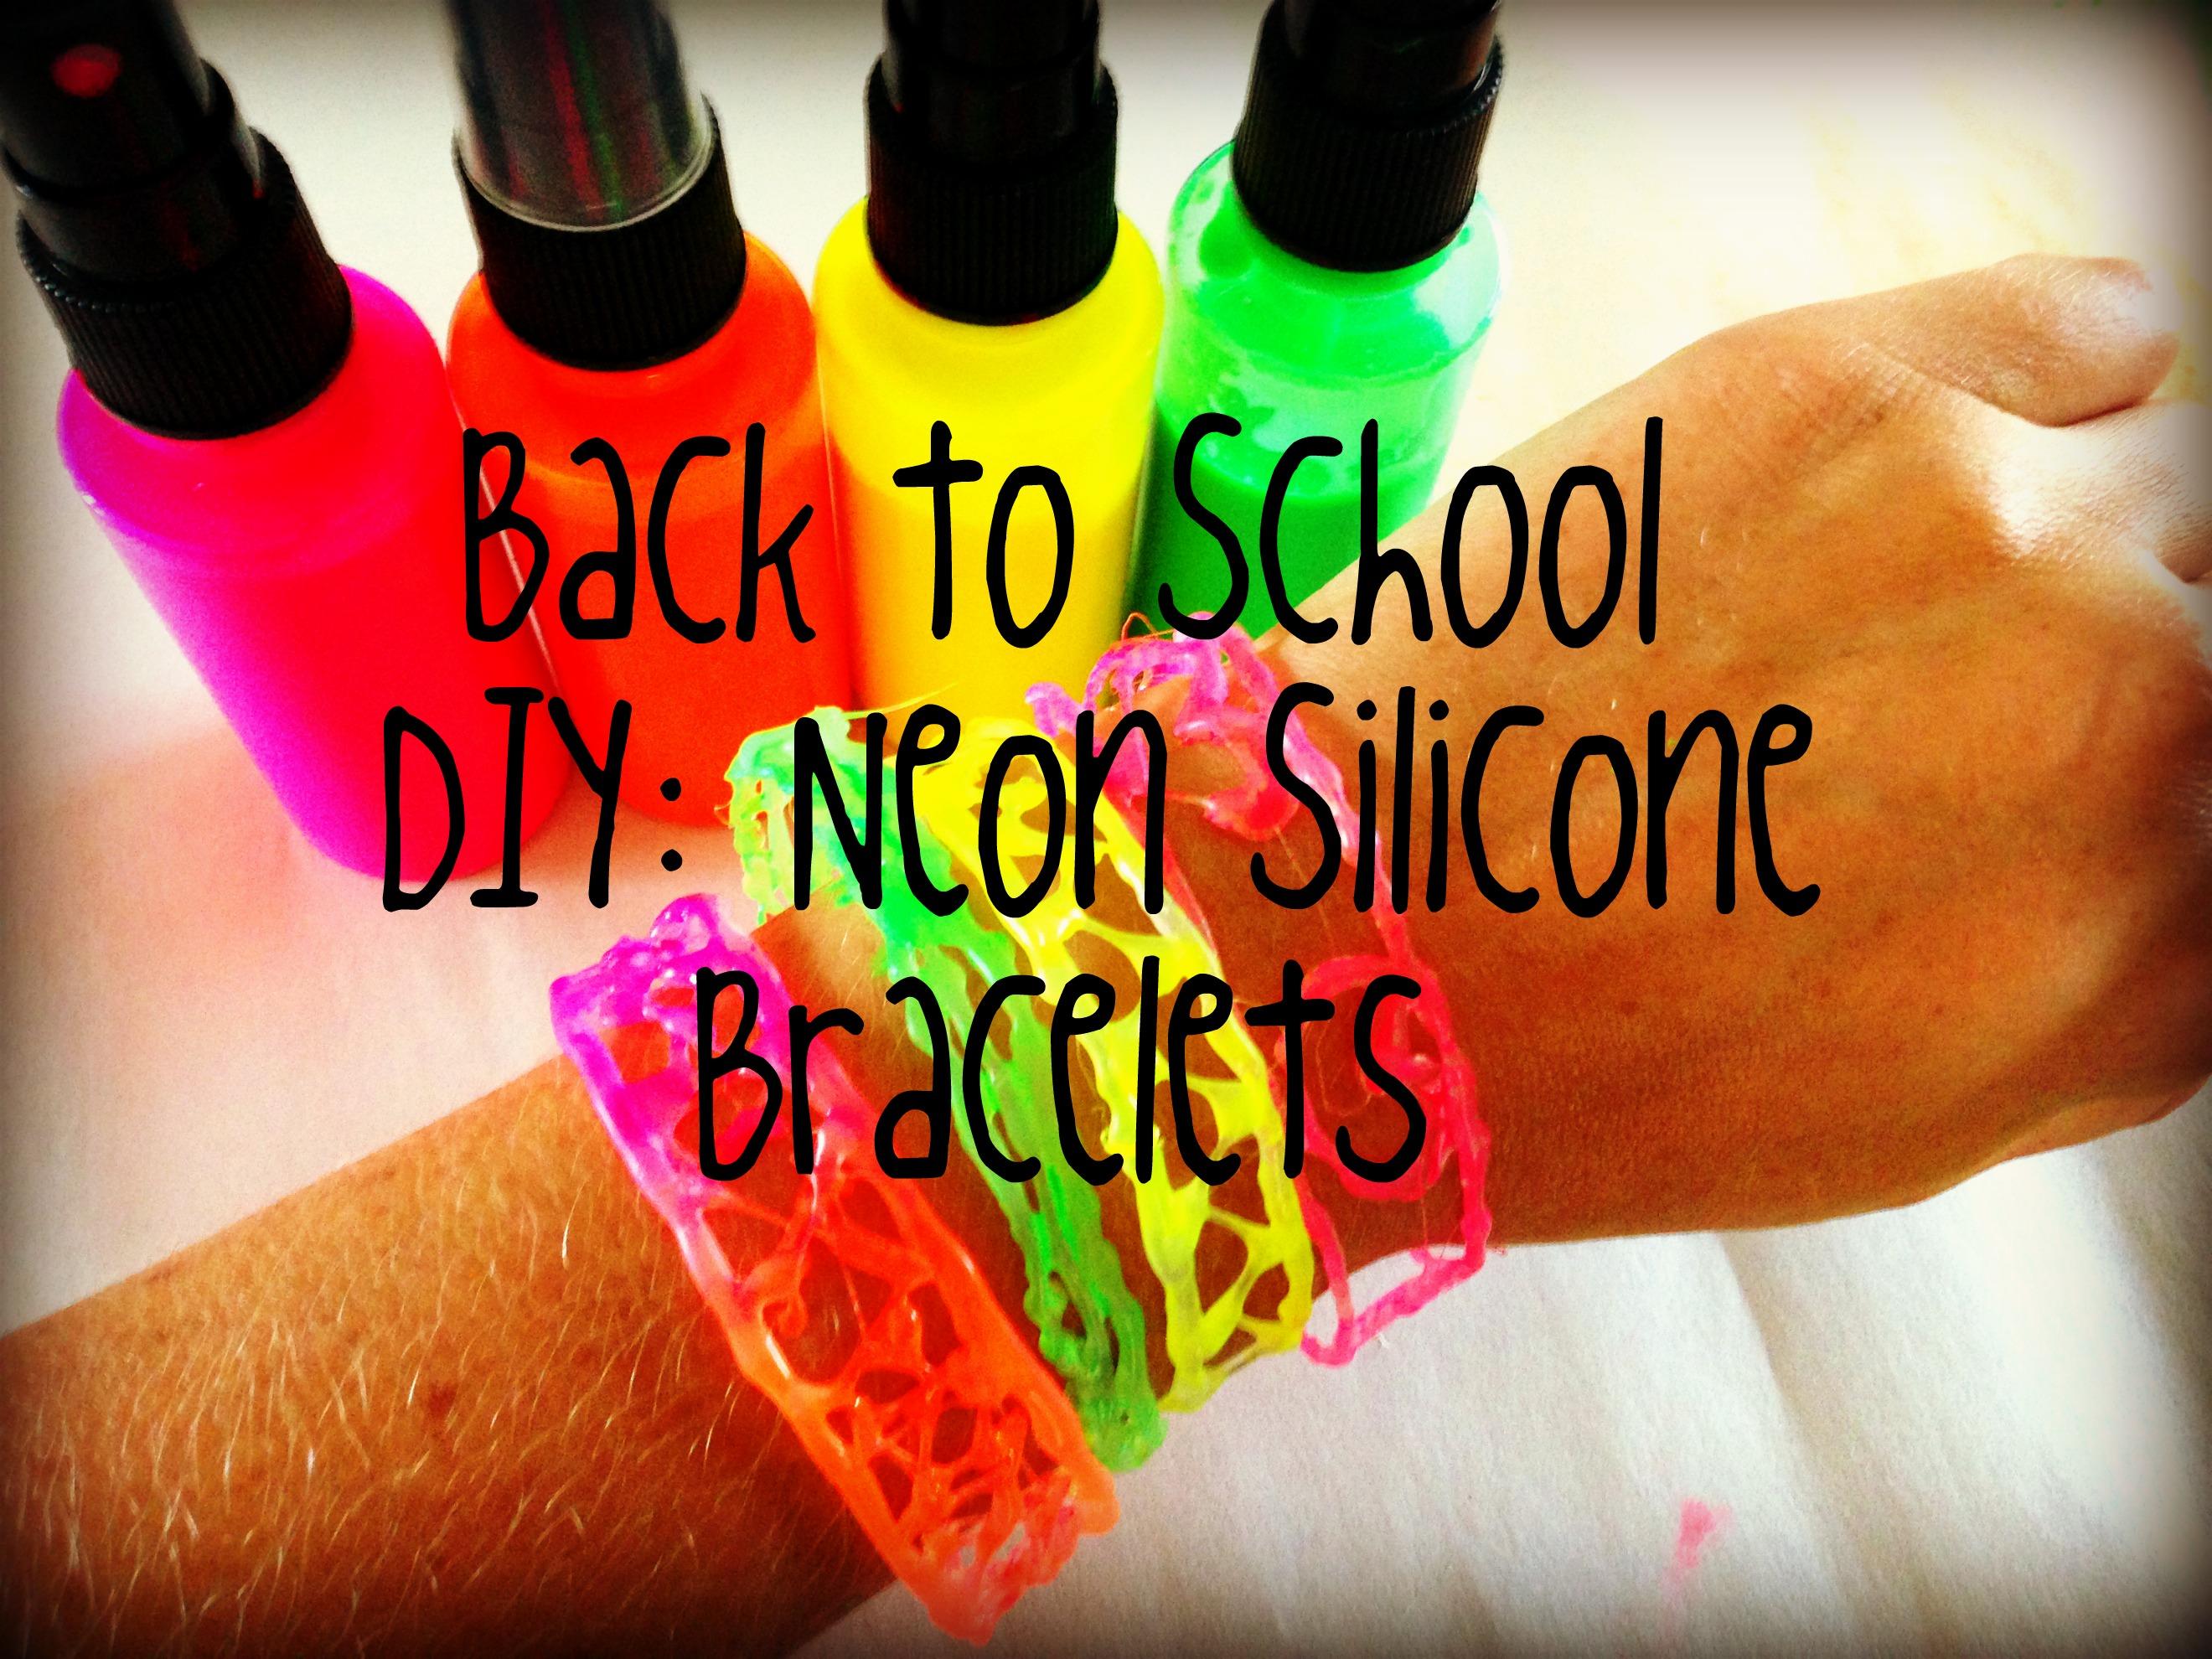 Back to School: DIY Neon Silicone Bracelets